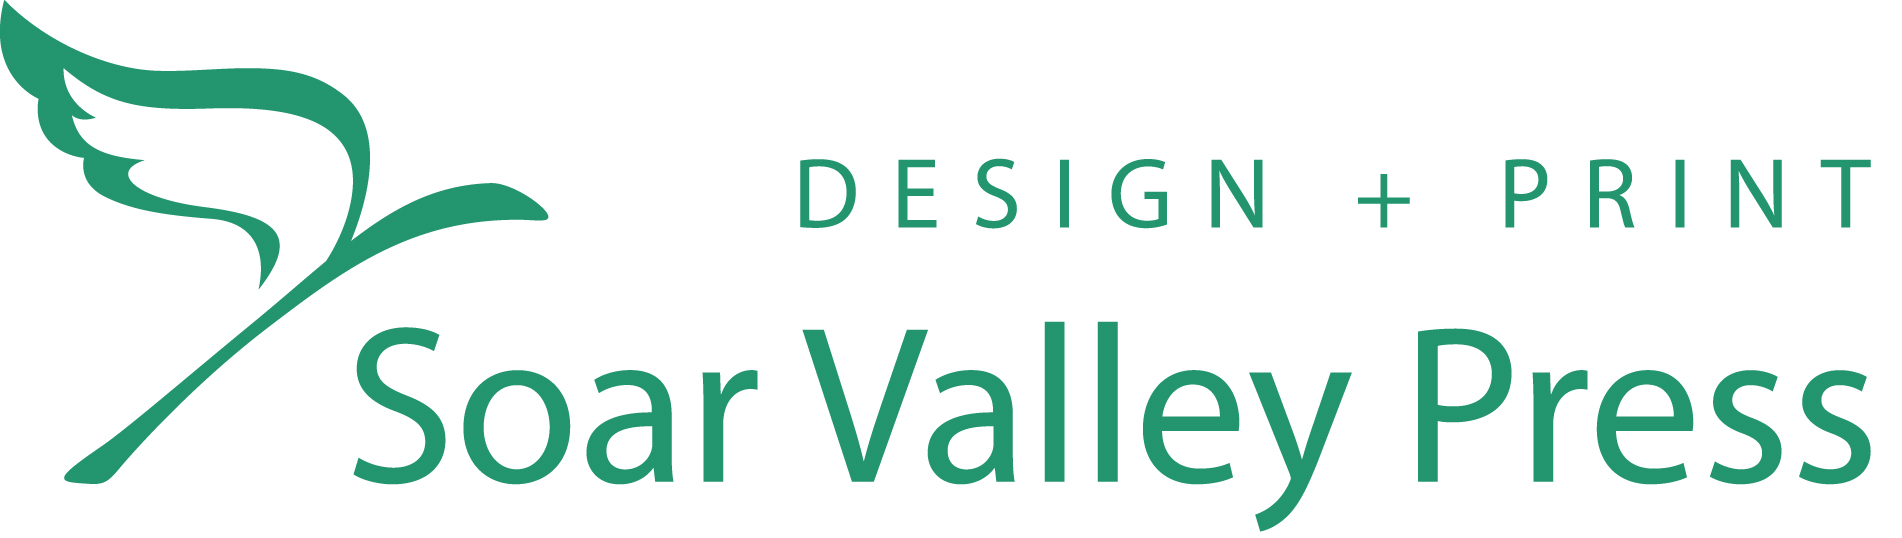 Soar Valley Press